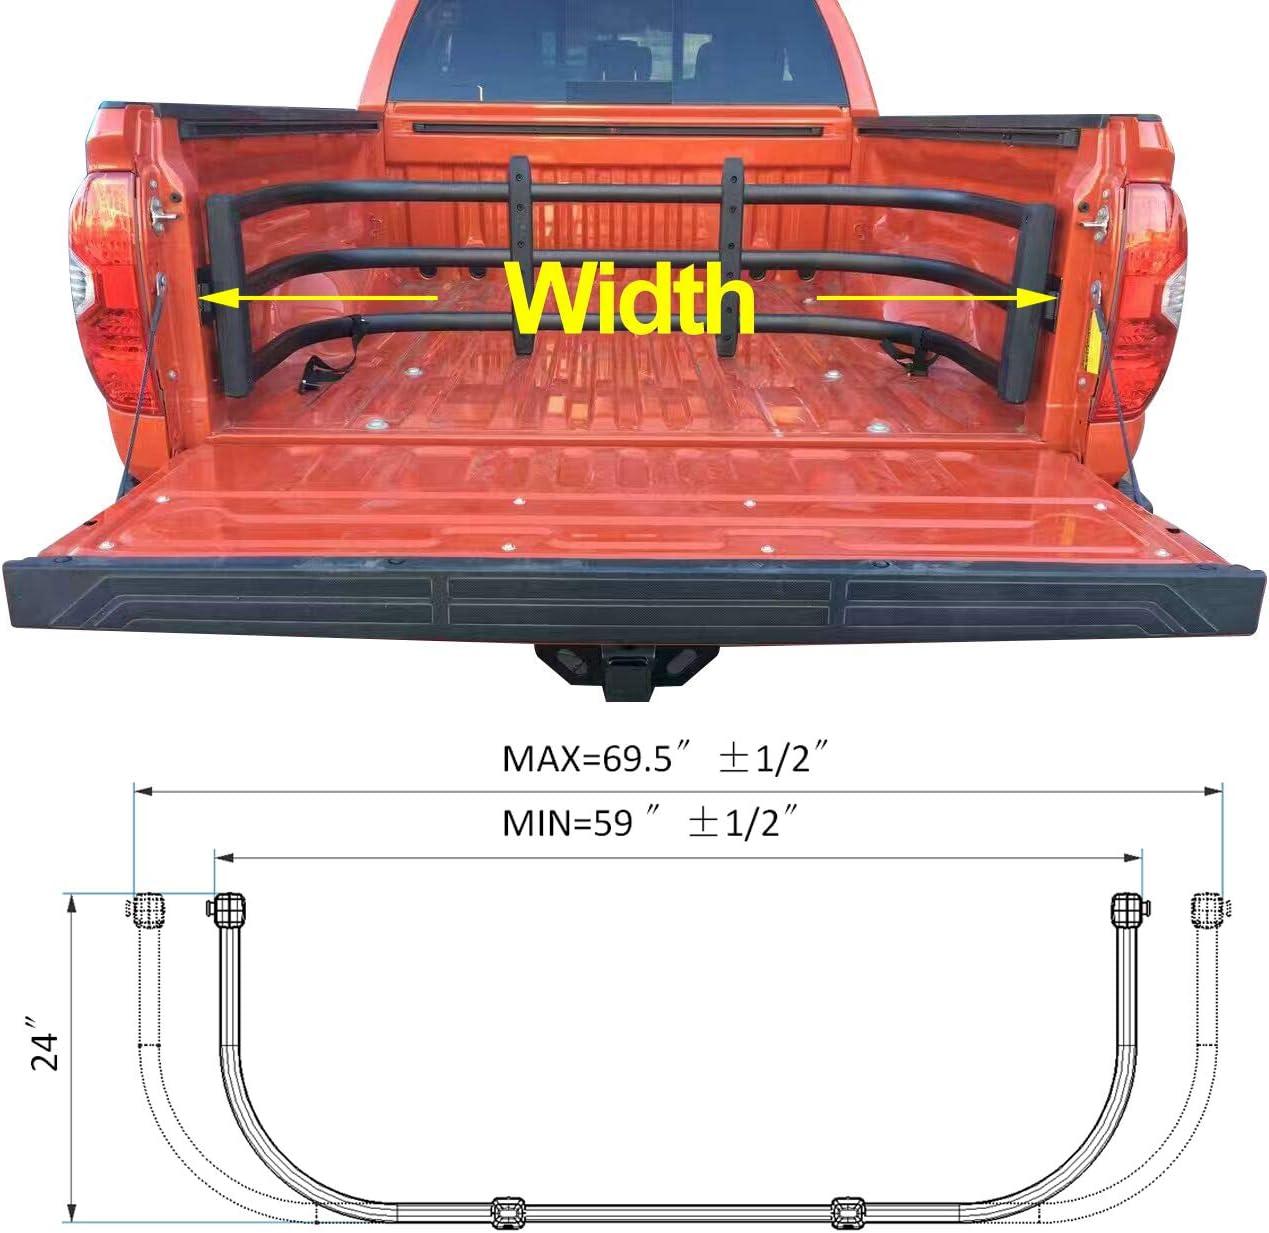 Bracket Kit Spurtar Truck Bed Extender Black Aluminum HD Max Universal Tailgate Extension for Pickup Trucks incl